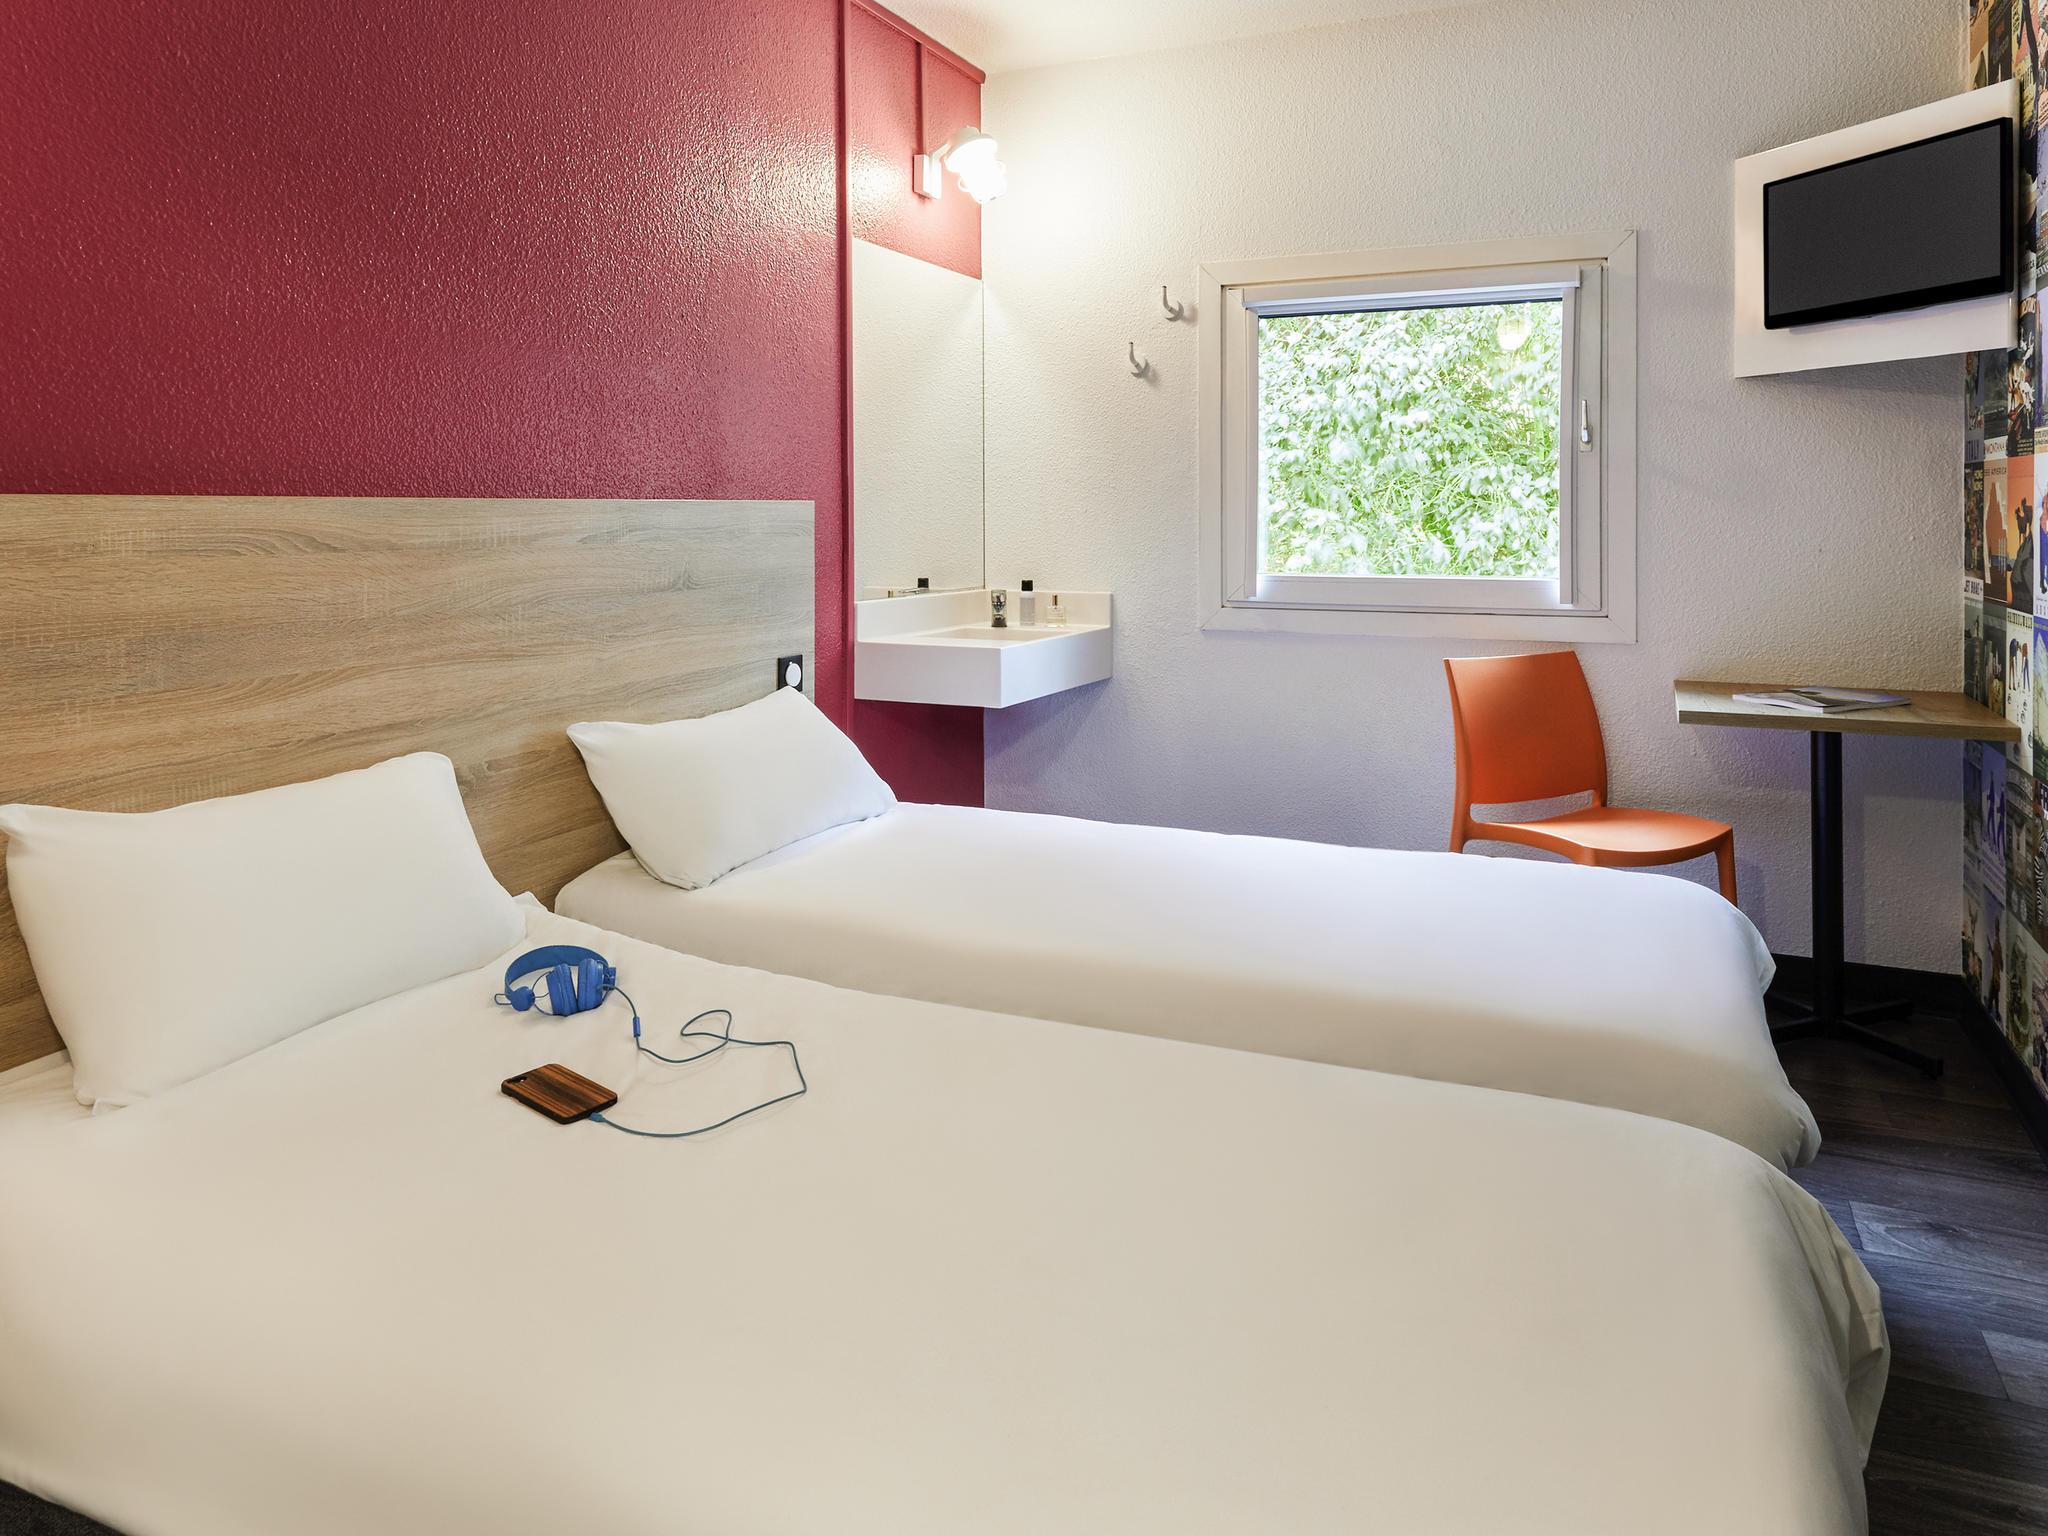 Hotel – hotelF1 Rungis Orly (rénové)